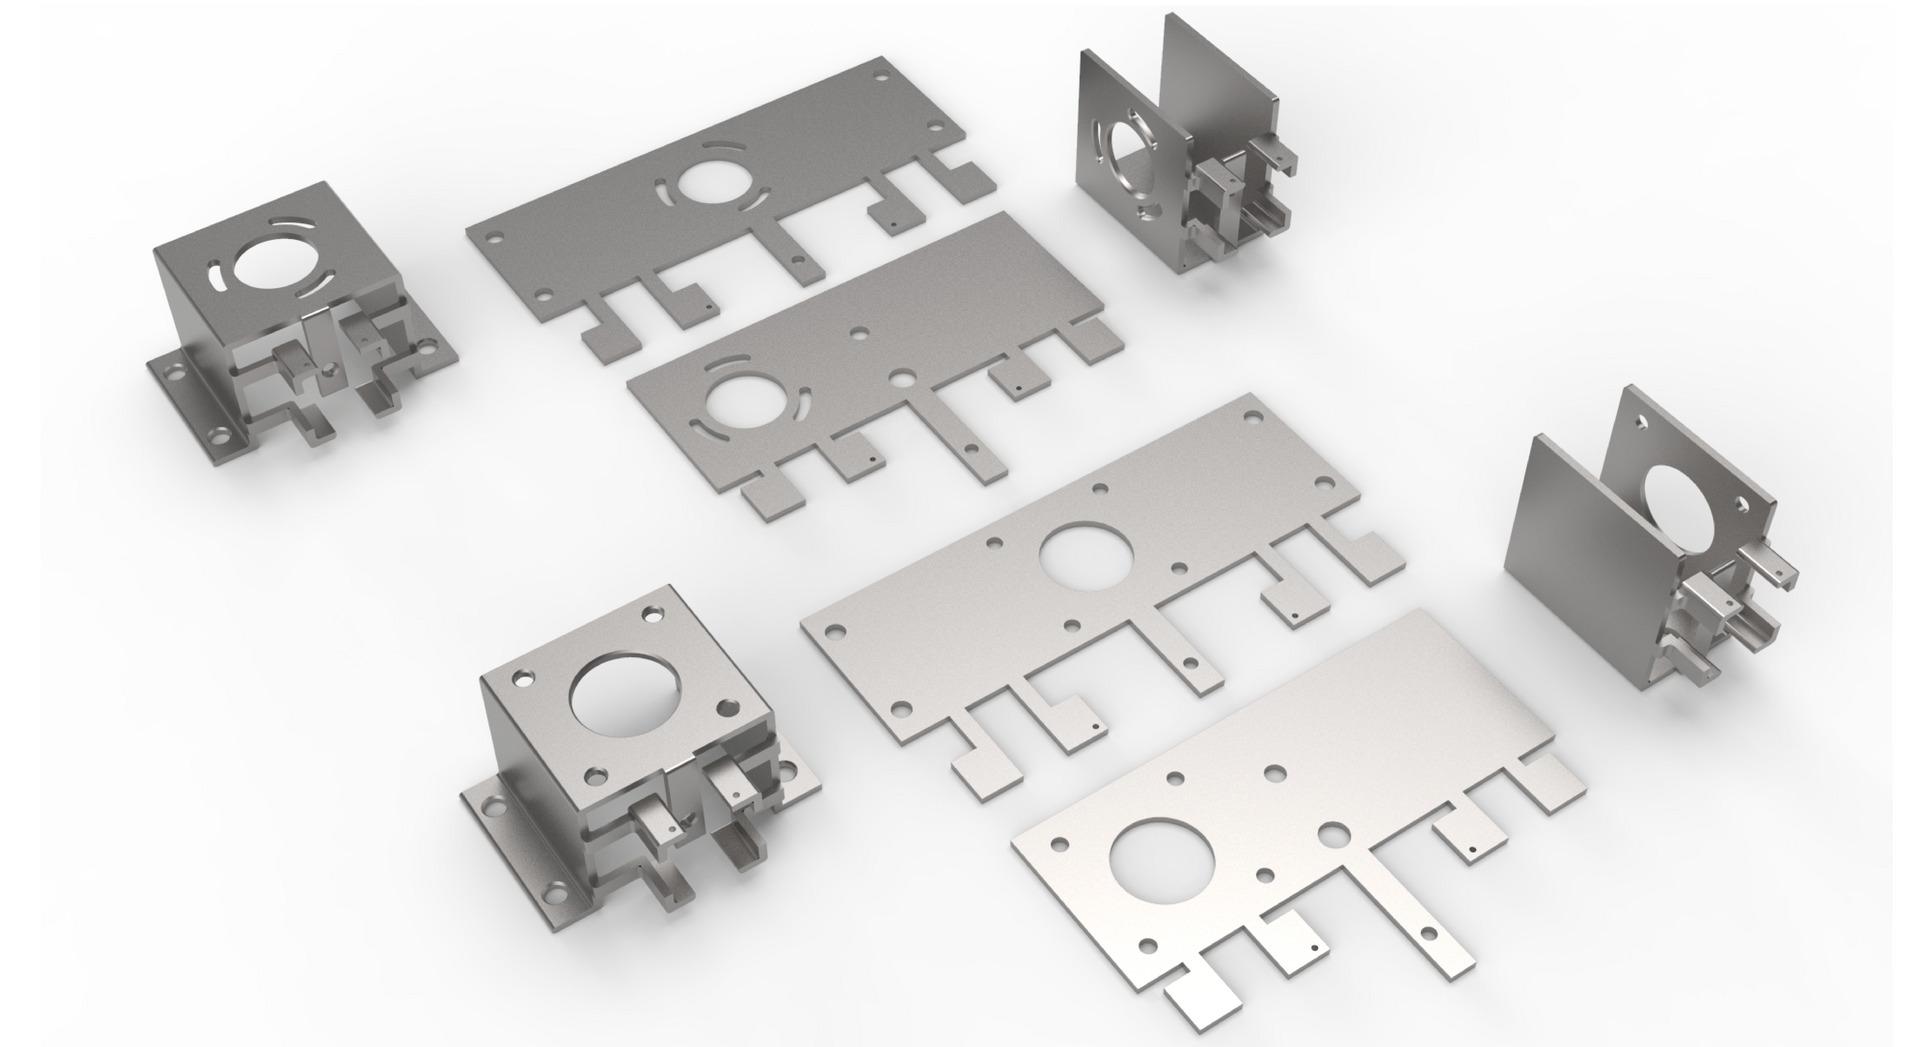 part deisgn for metal folding